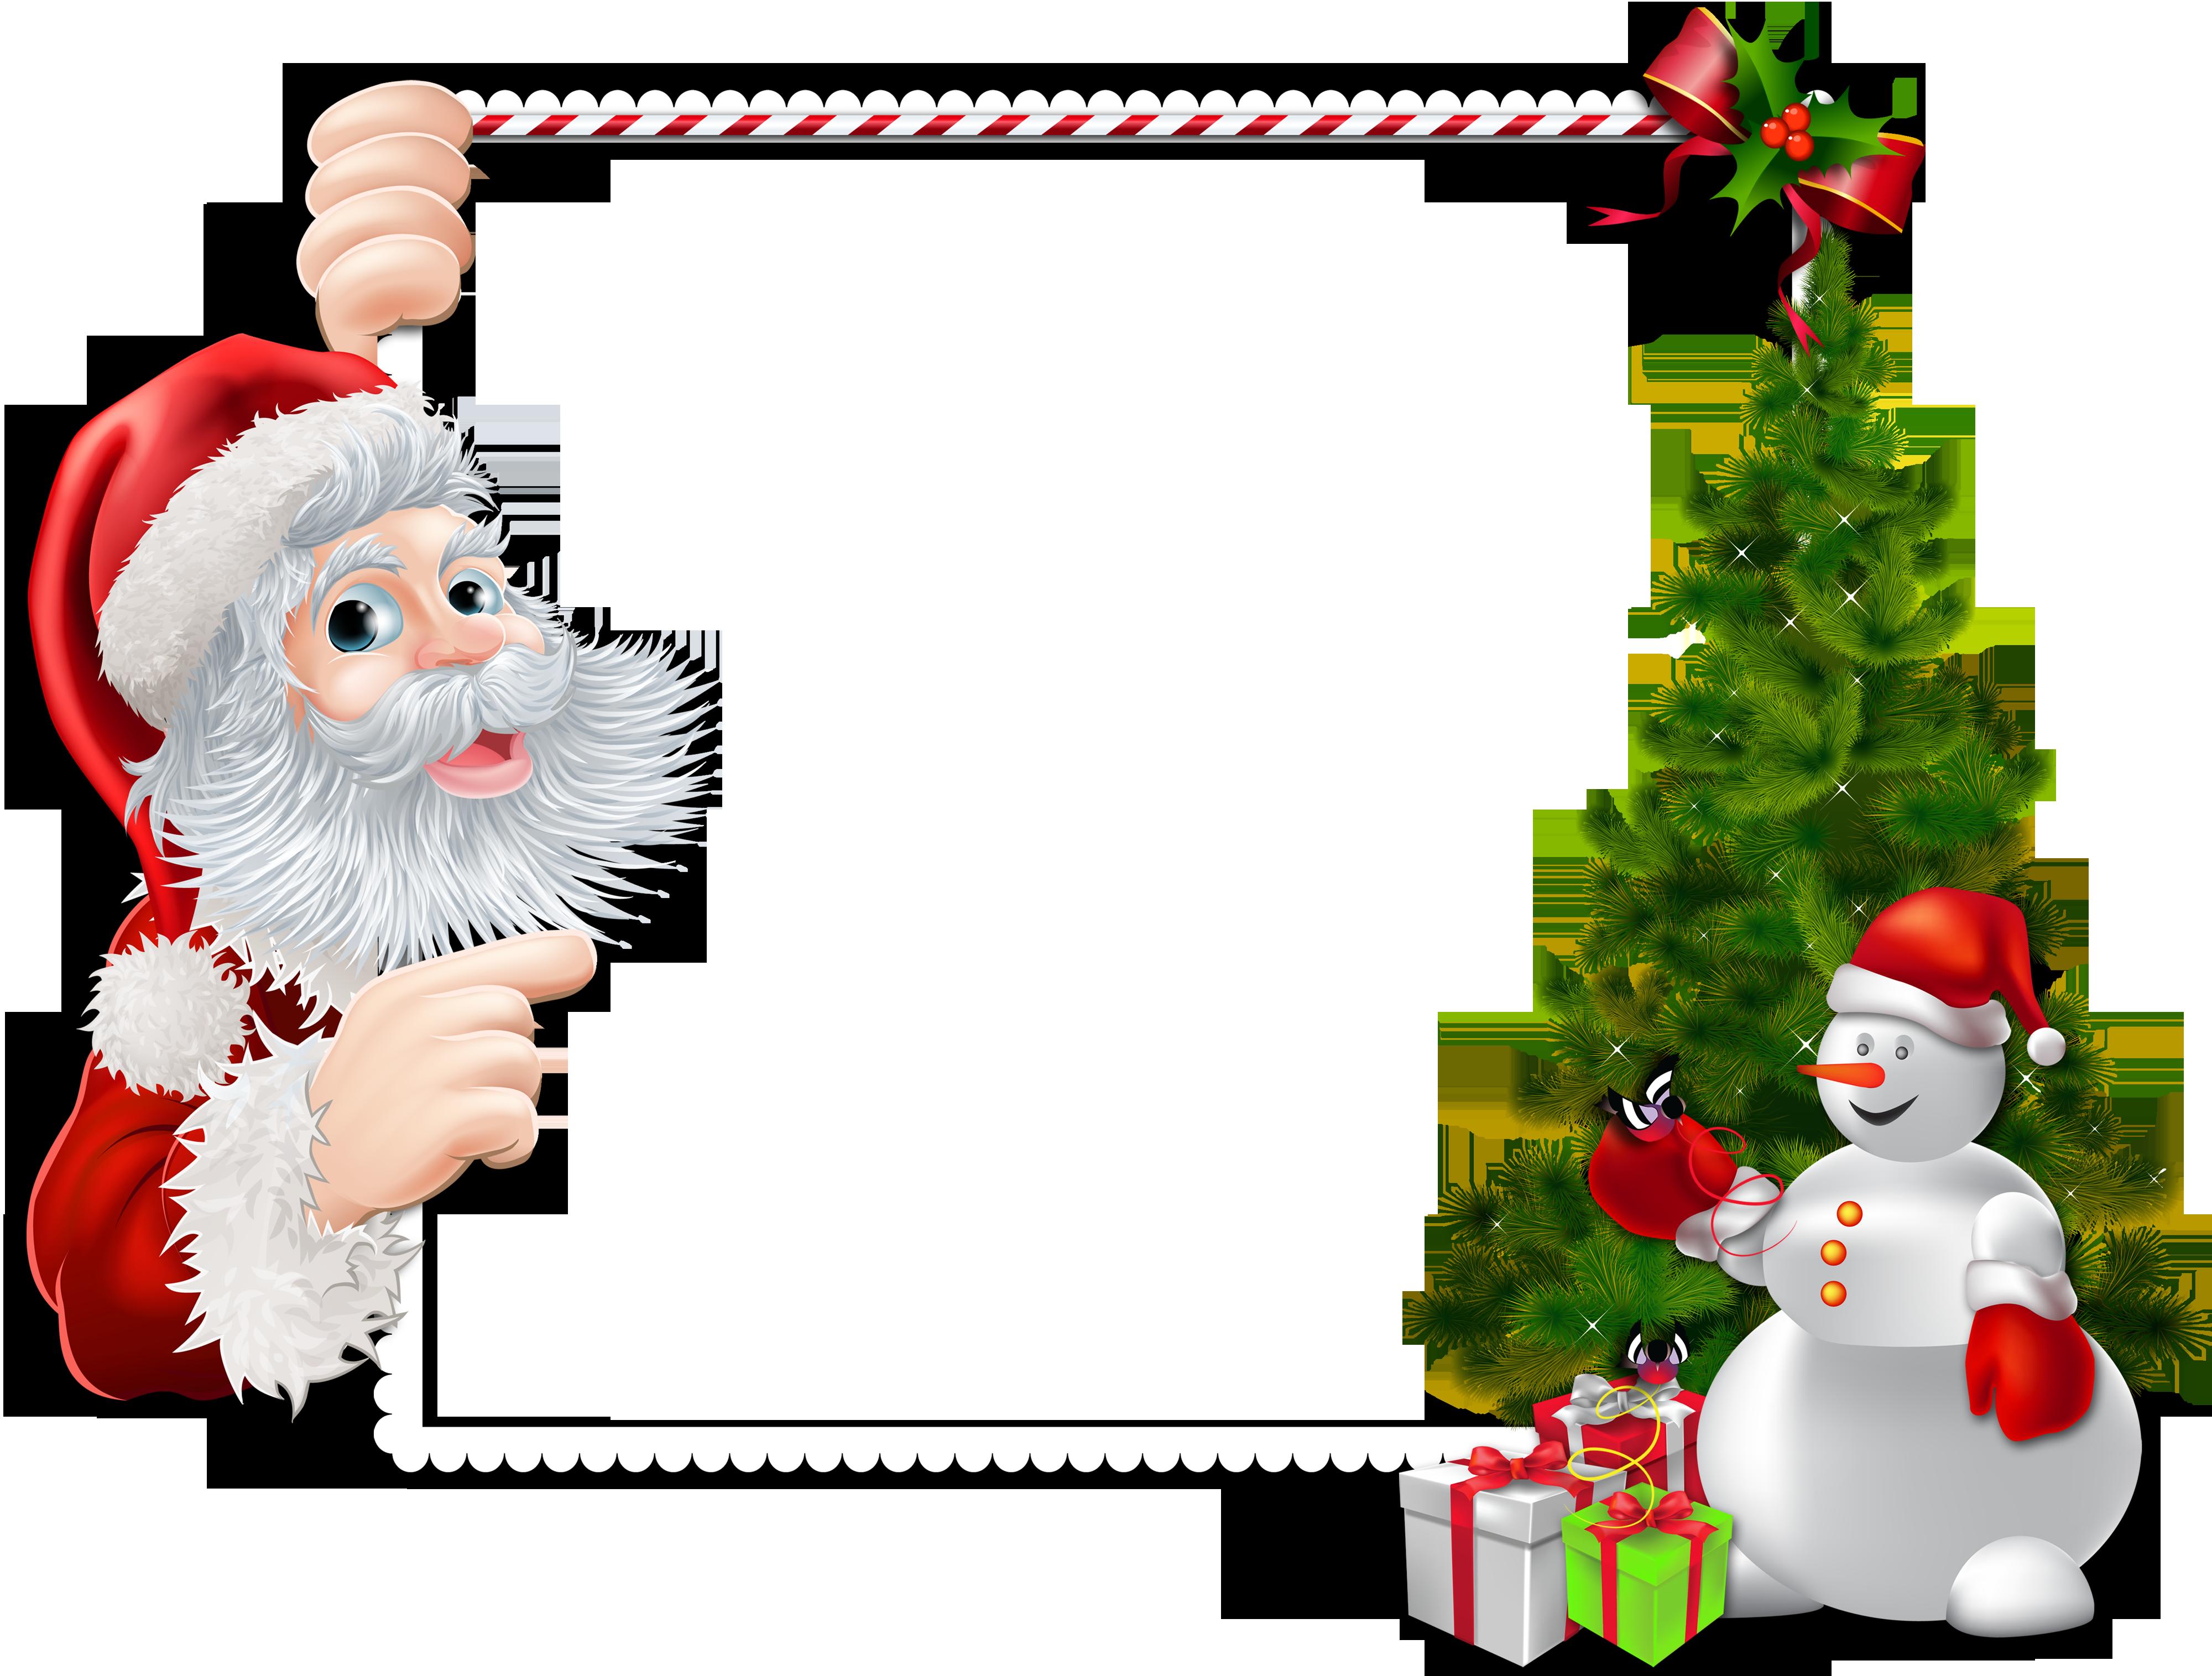 Silviub 12 Months Ago Christmas Christmas Frames Frame Png Santa Claus